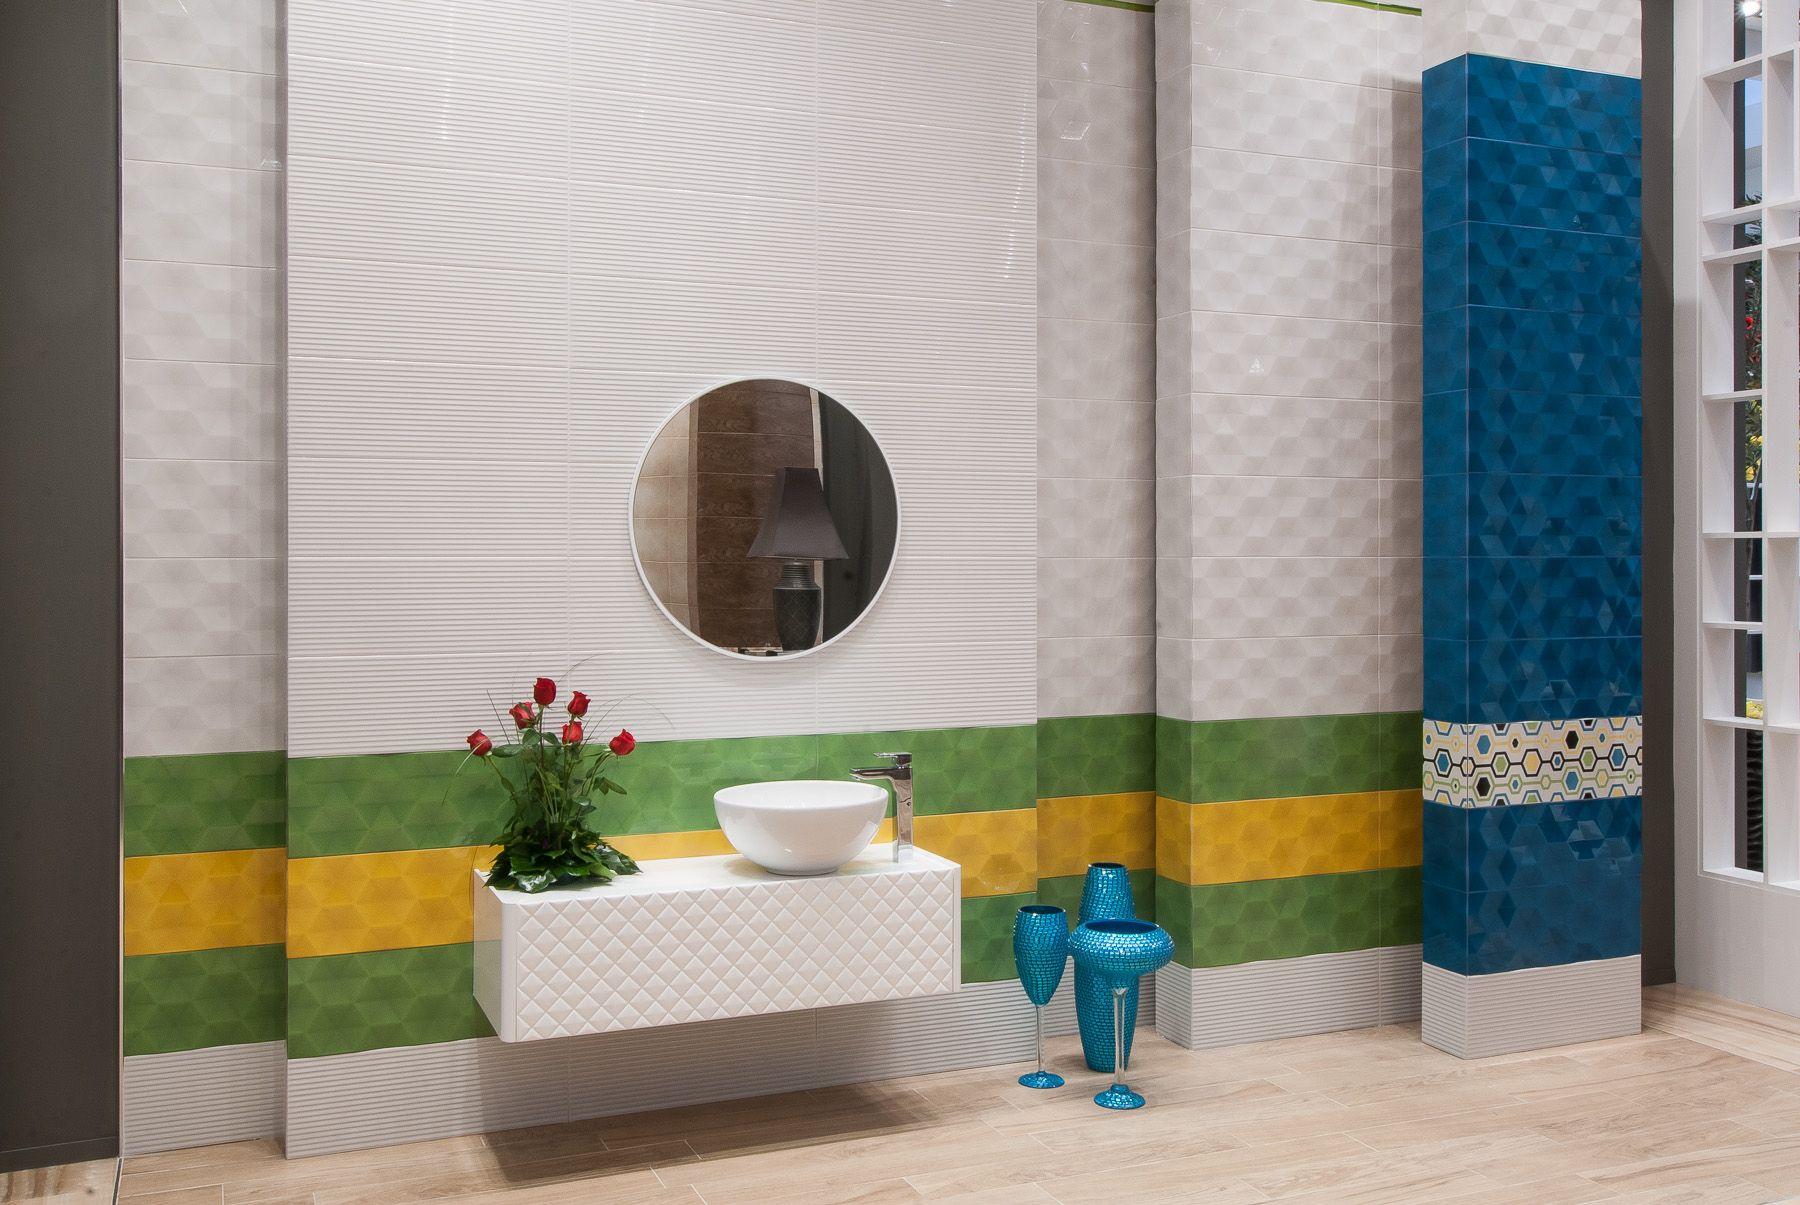 Shock spring 25x70 modern wall tiles 25x70 by venus pinterest shock spring 25x70 dailygadgetfo Gallery